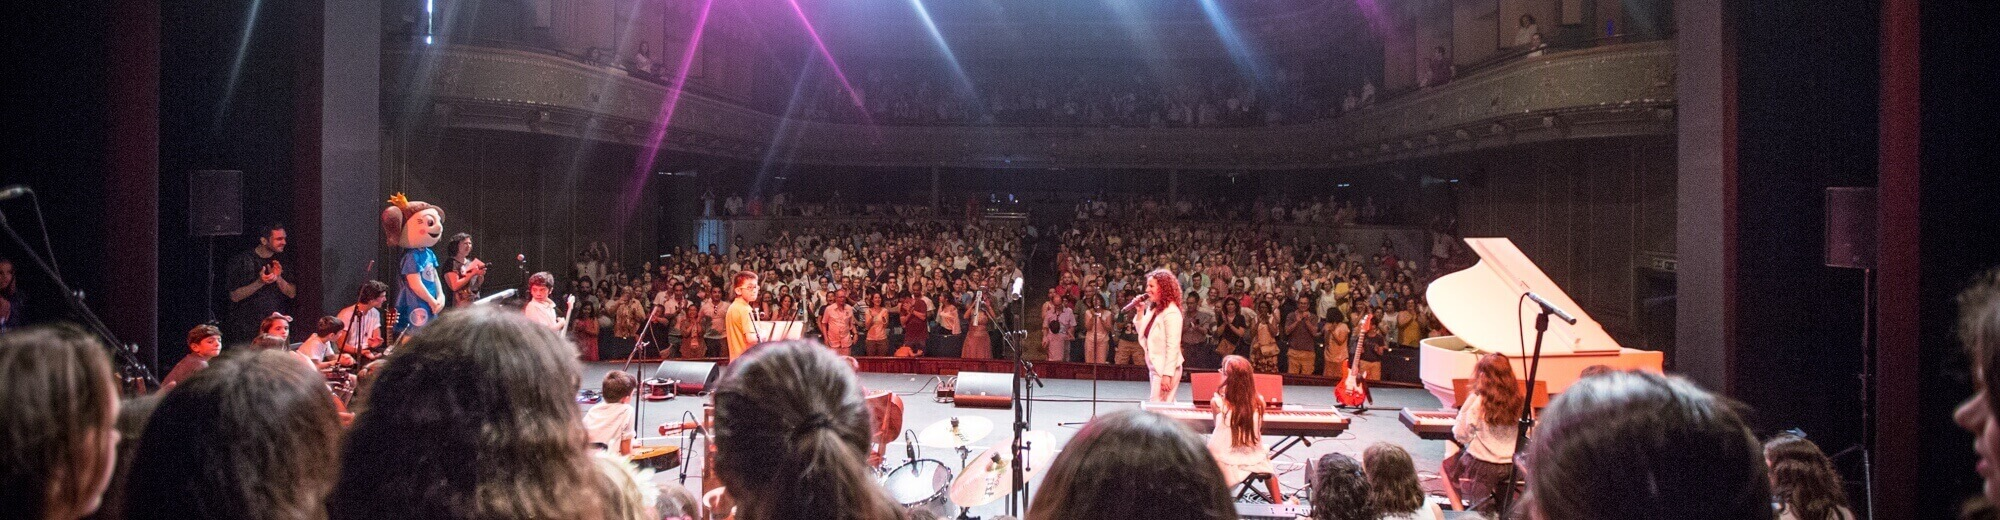 academia de música academia de música Academia de Música Bloom Festival musica portugues